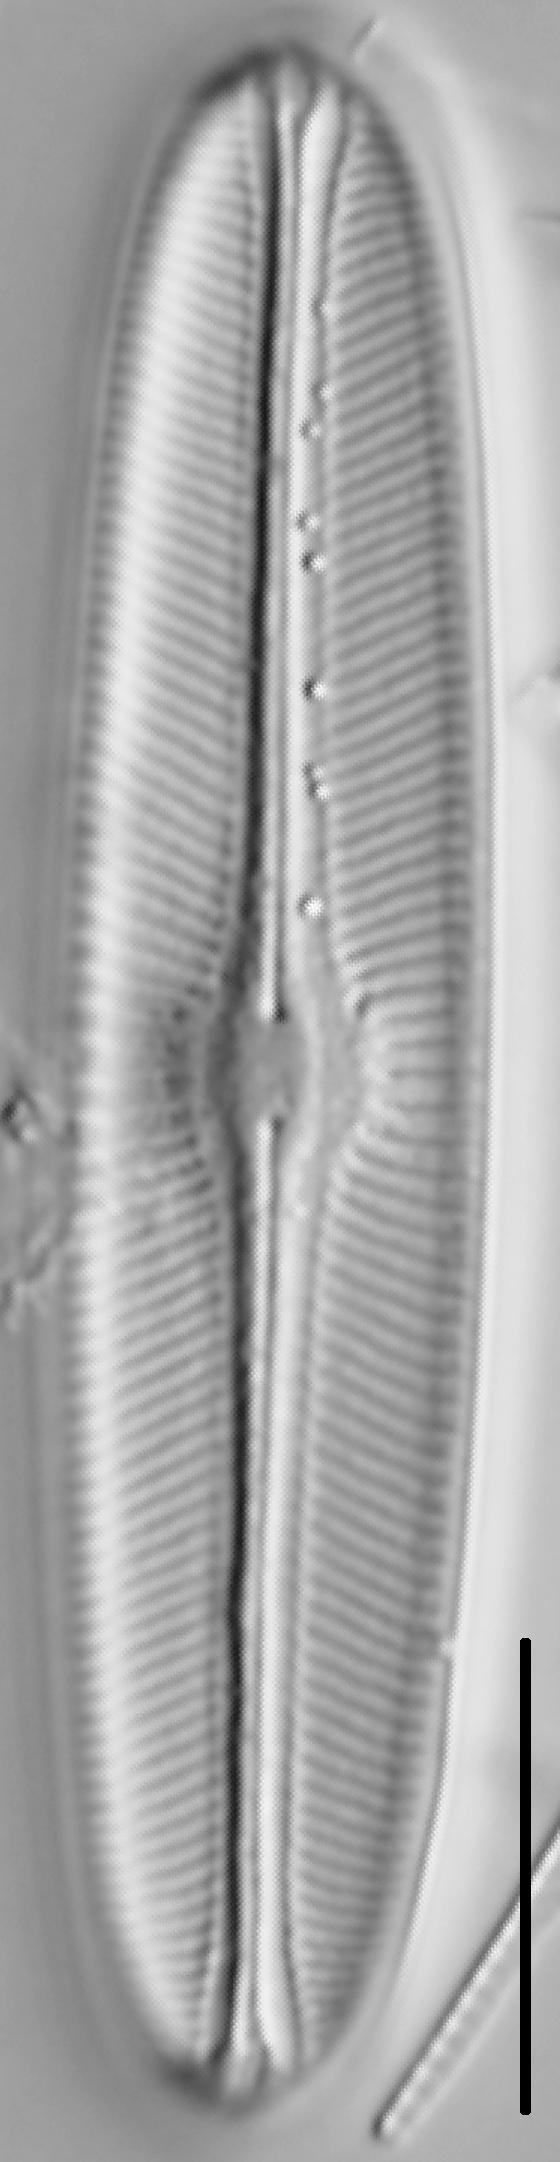 Sellaphora bacillum LM6